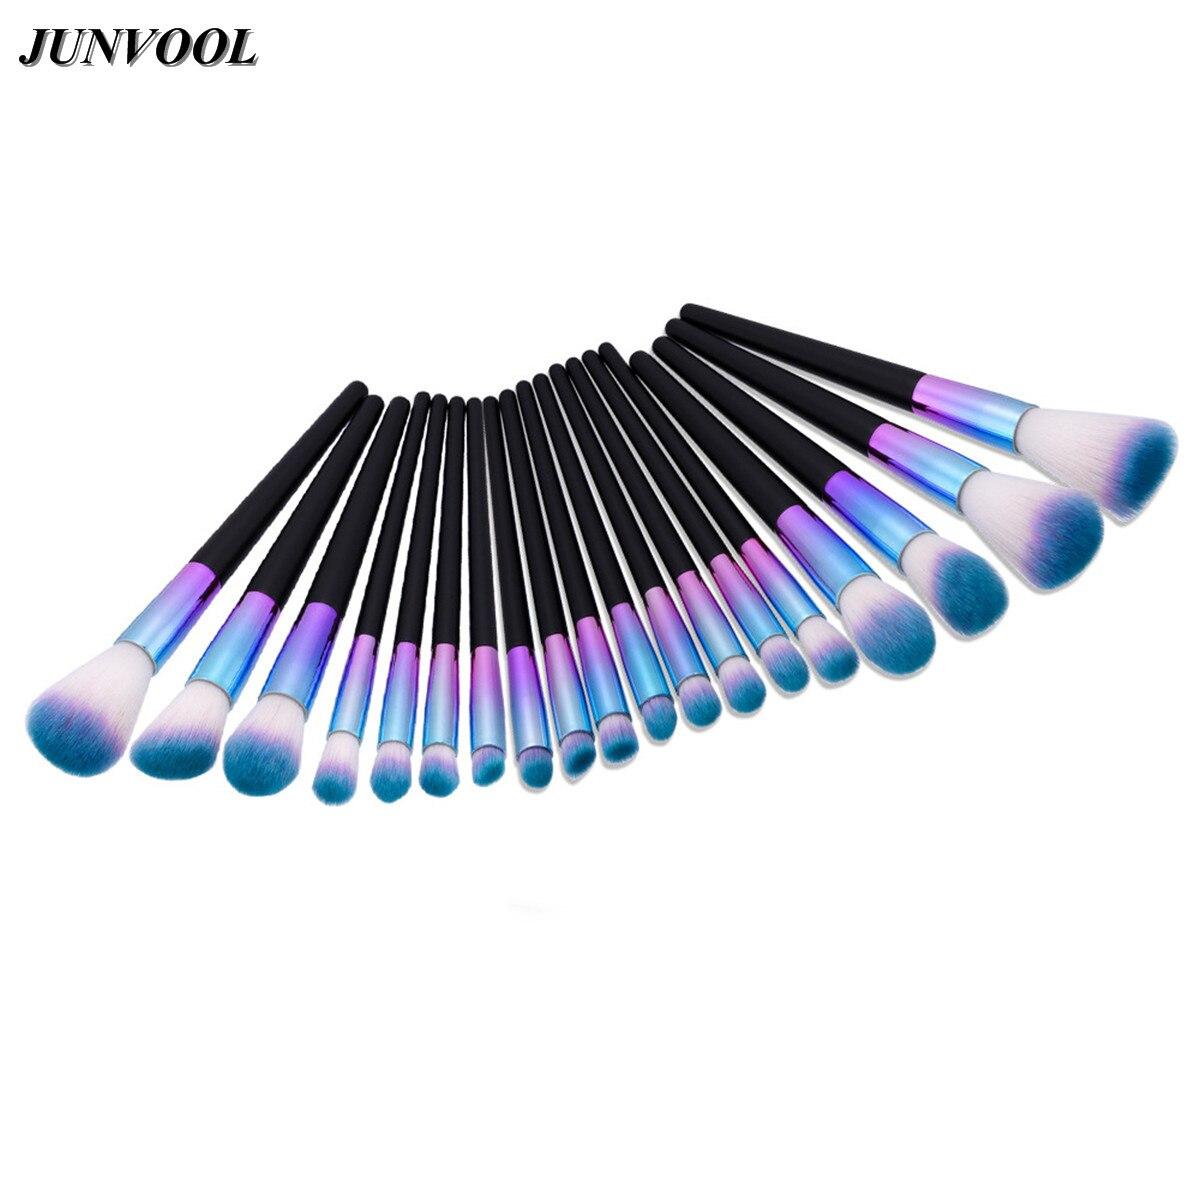 Glitter Blue Makeup Brushes Set 19Pcs Soft Hair Professional Artist Brush Cosmetic Make Up Tools Cosmetics Blending Maquiagem